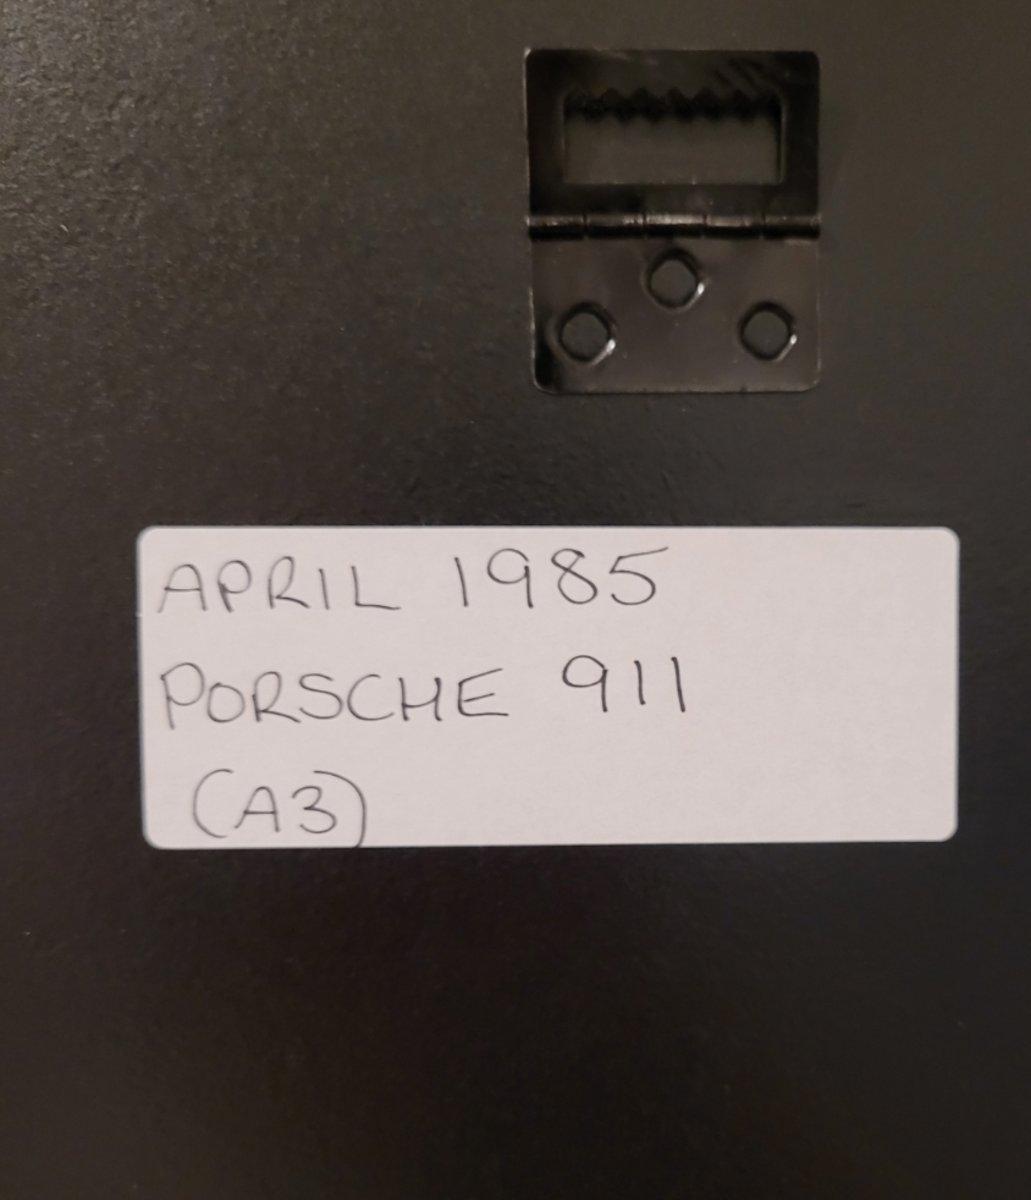 1965 Original 1985 Porsche 911 Framed Advert For Sale (picture 2 of 3)